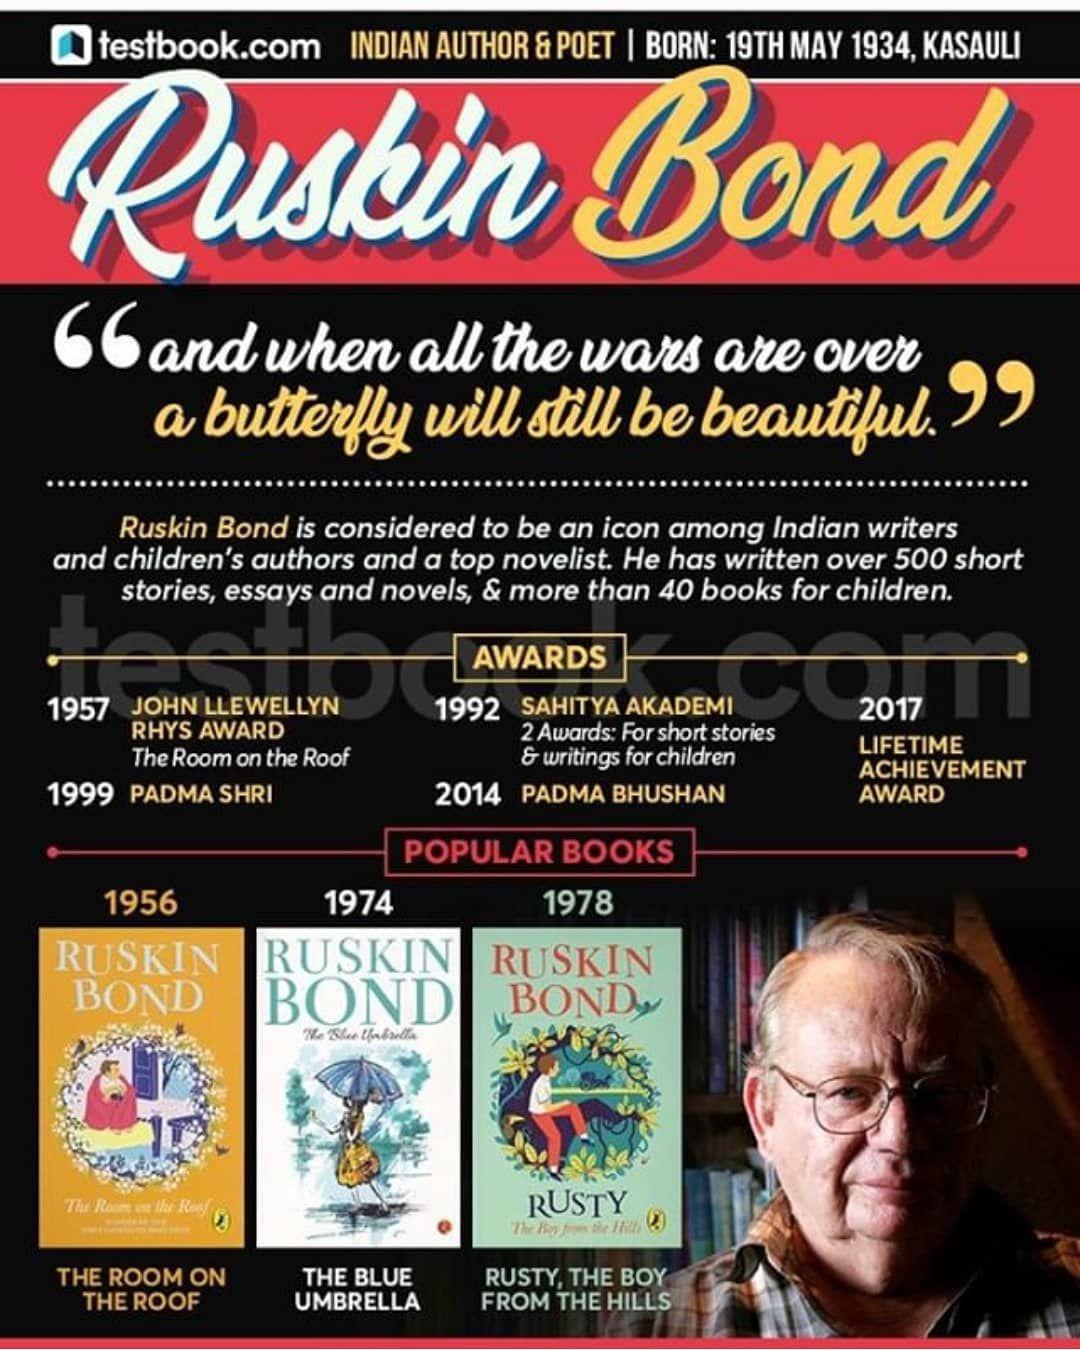 Author Writer Ruskin Bond Book Love Beautiful Photooftheday Like4likes Followmenow Upsccoaching Upsc India Sscc Ruskin Bond Childrens Authors Bond